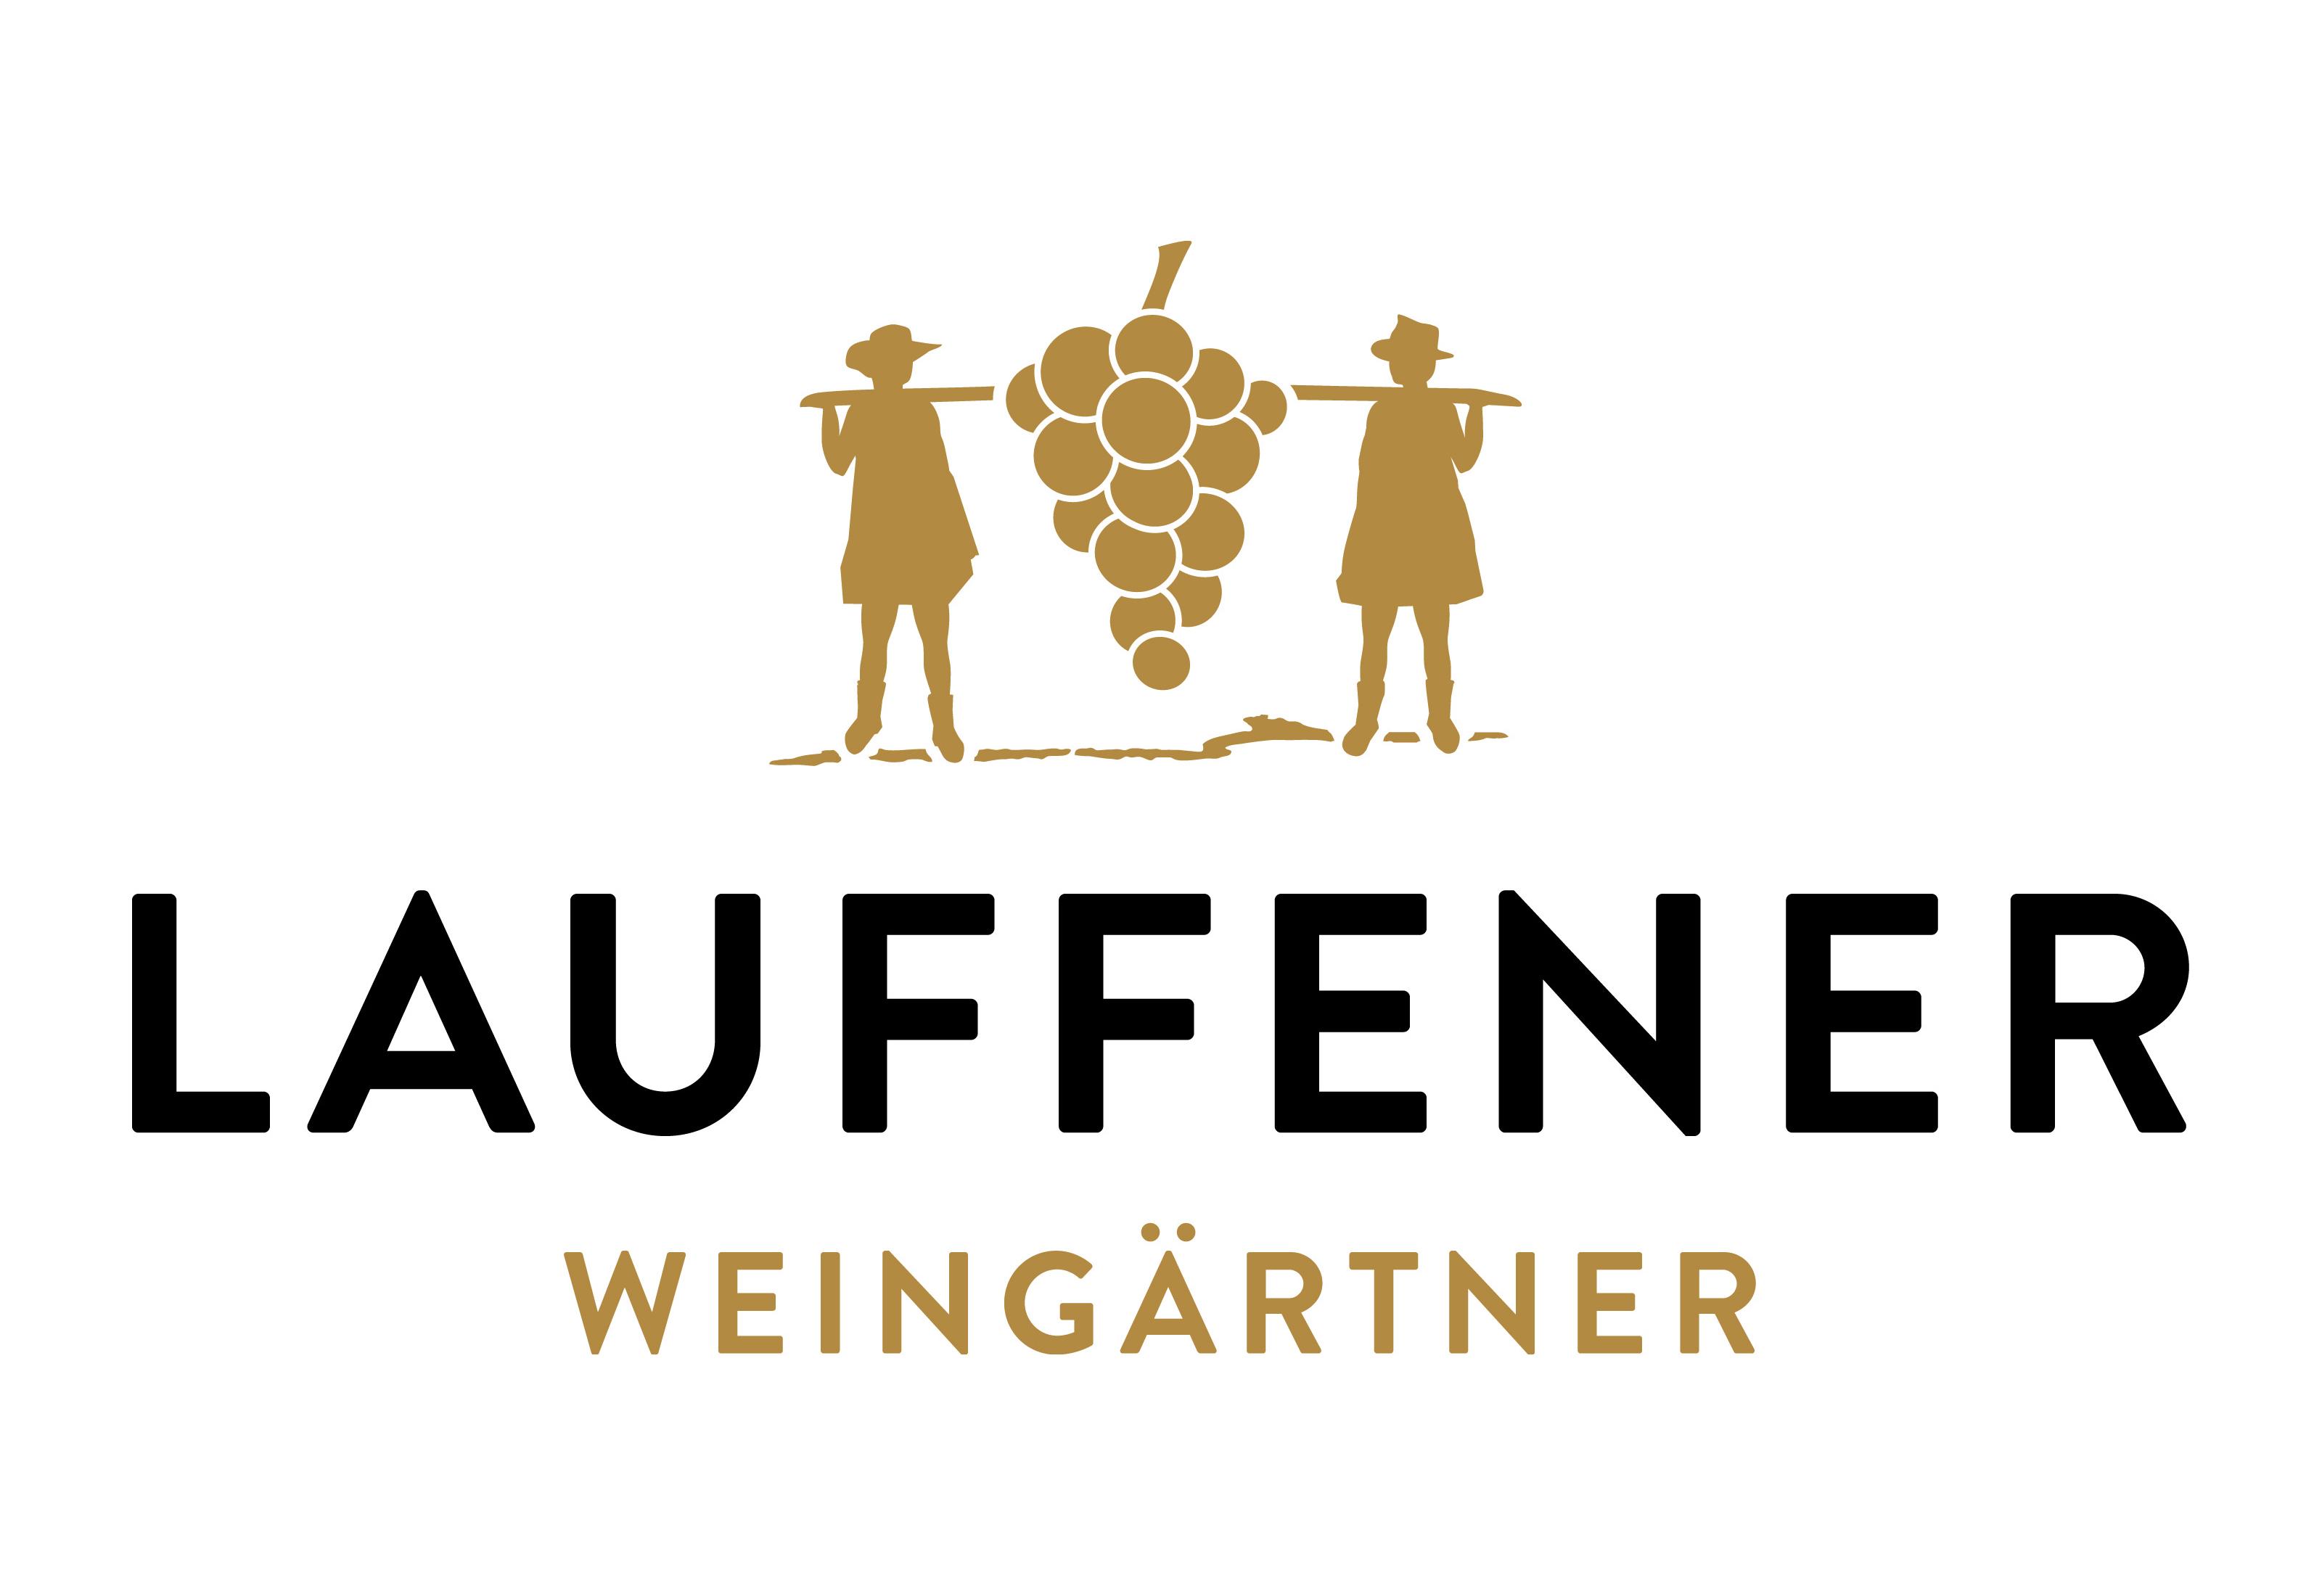 Lauffener Weingärtner